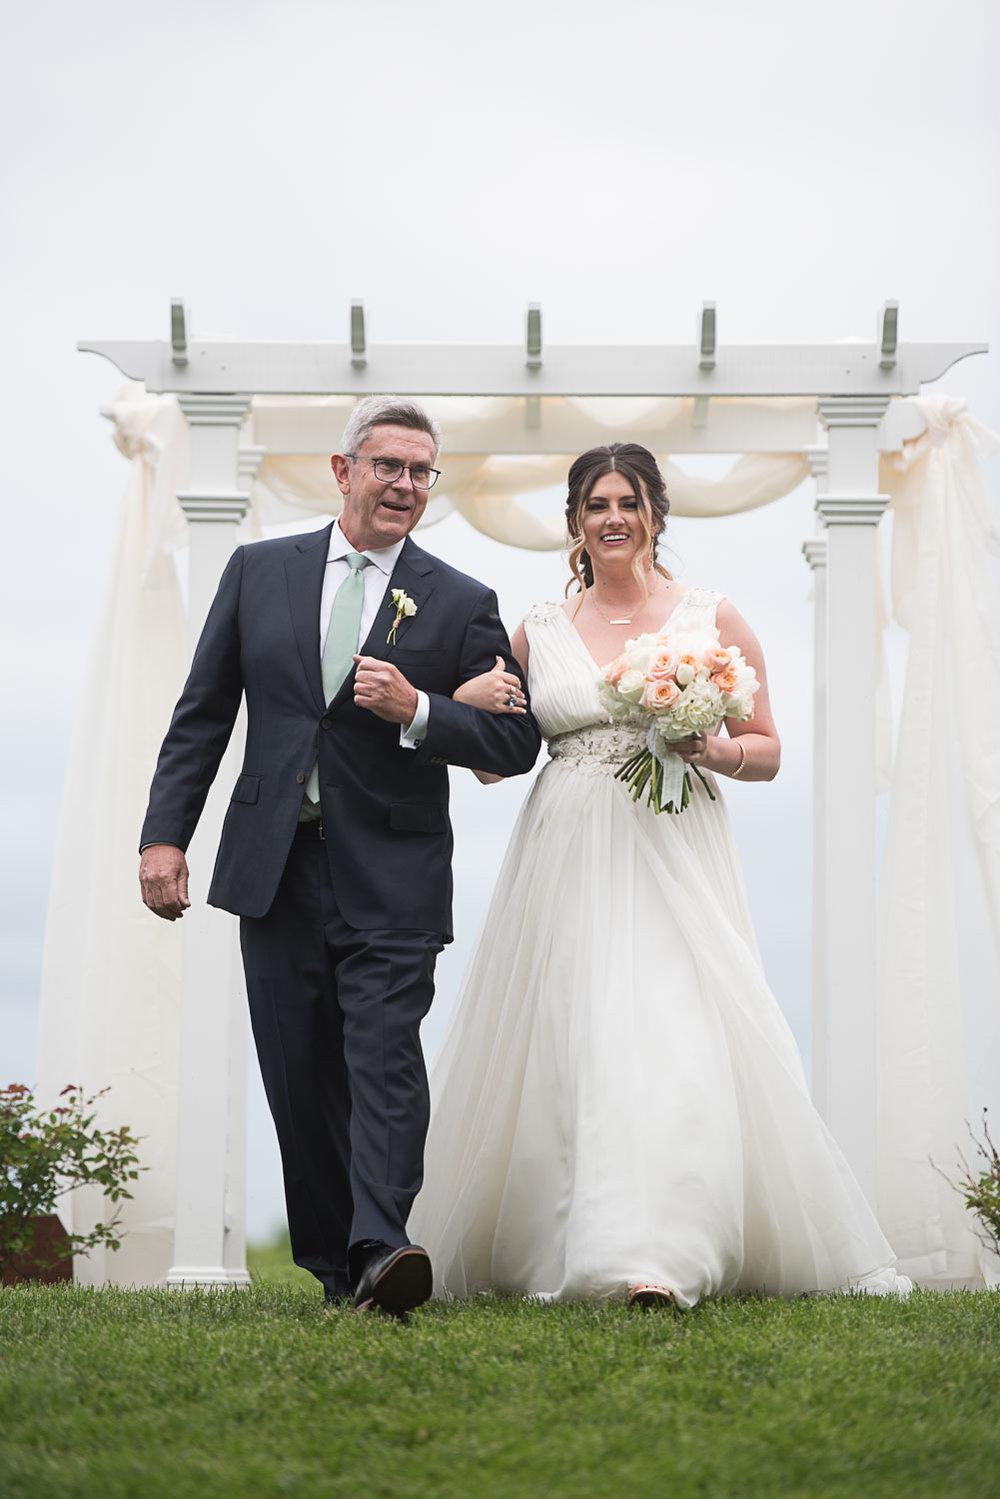 58 Outdoor wedding with summer bride.jpg